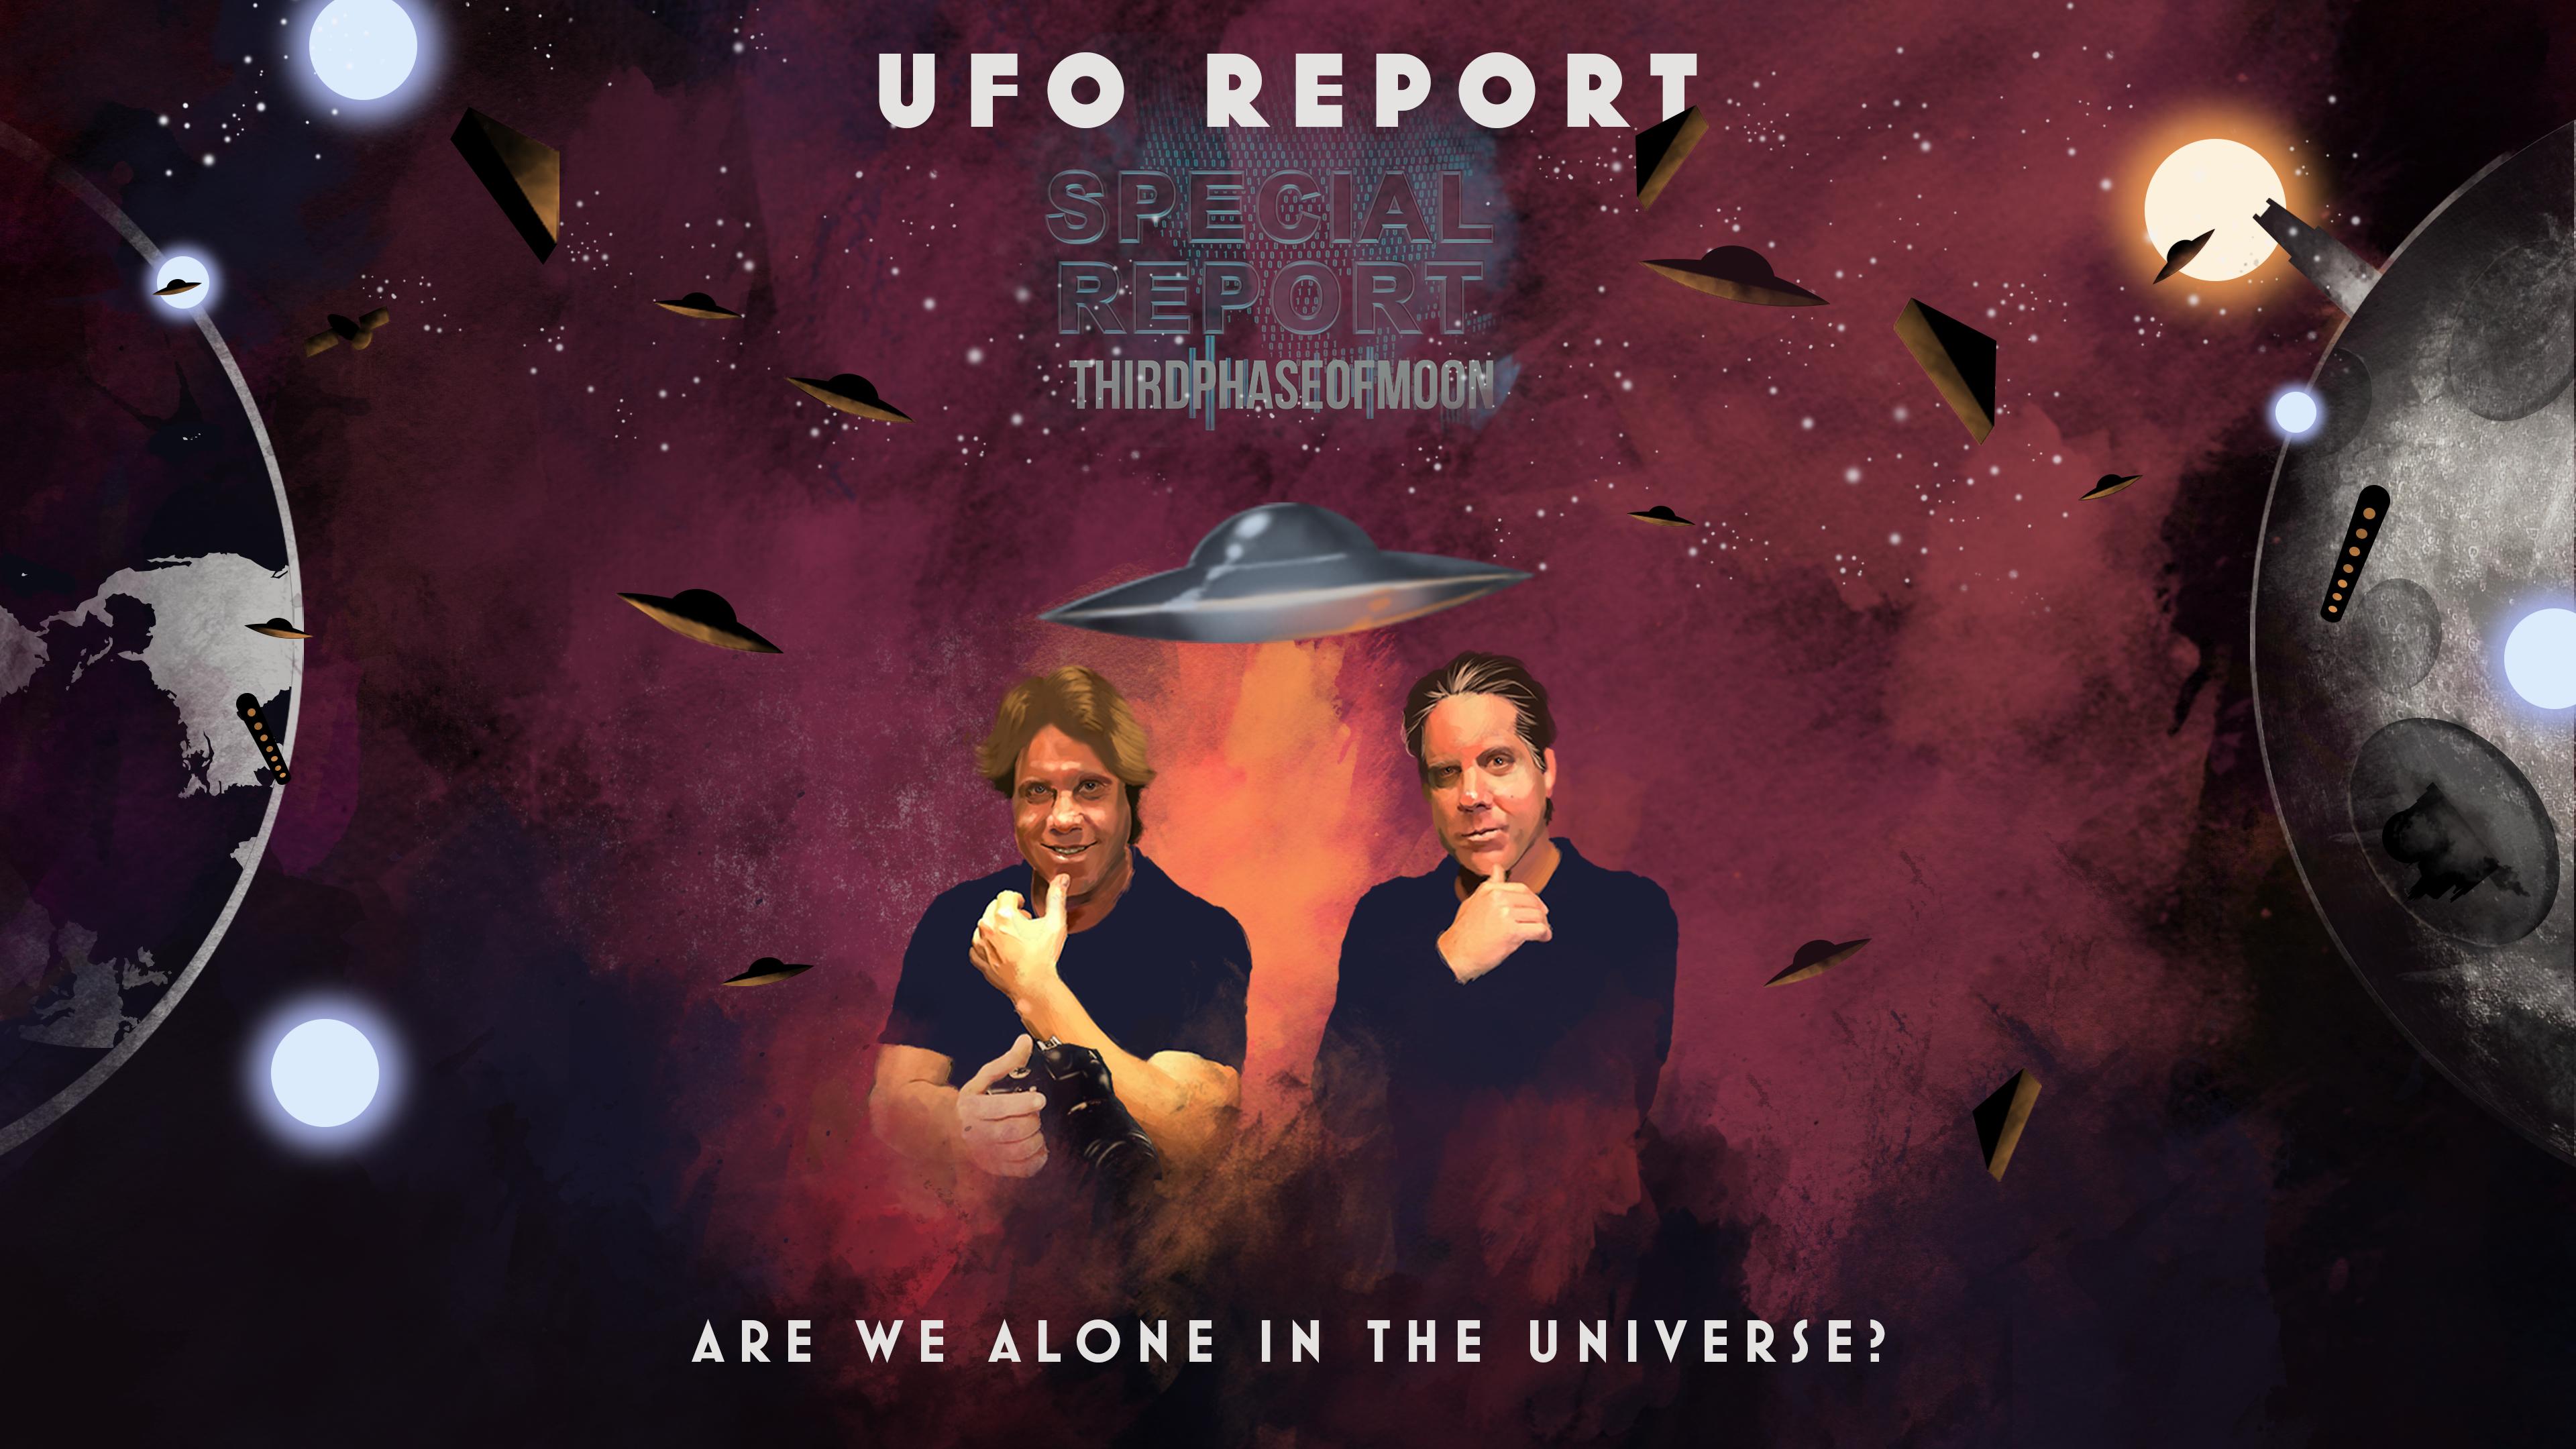 UFO Report on Amazon Prime Video UK